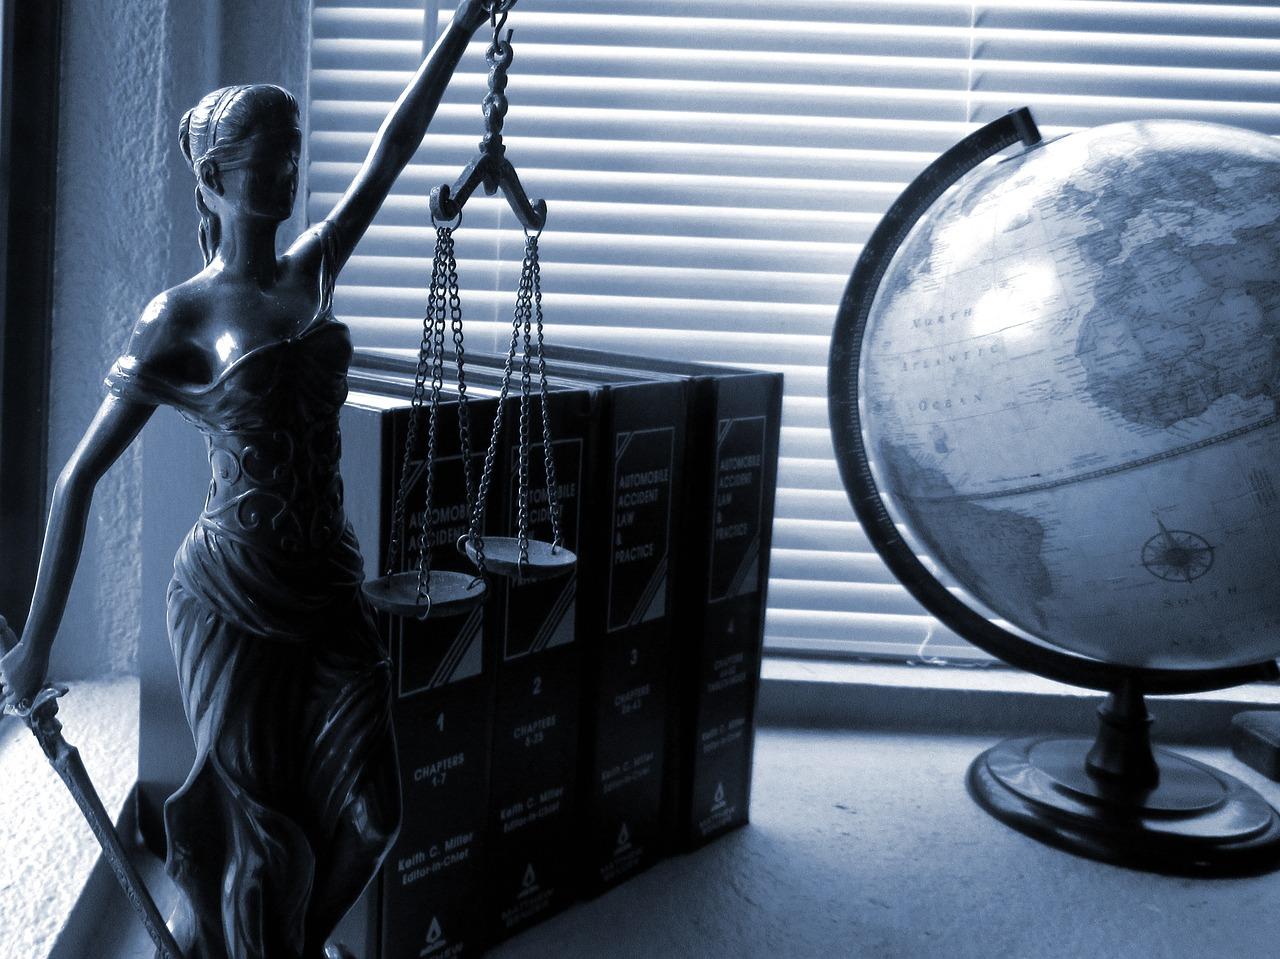 Llei crèdit immobiliari, les hipoteques